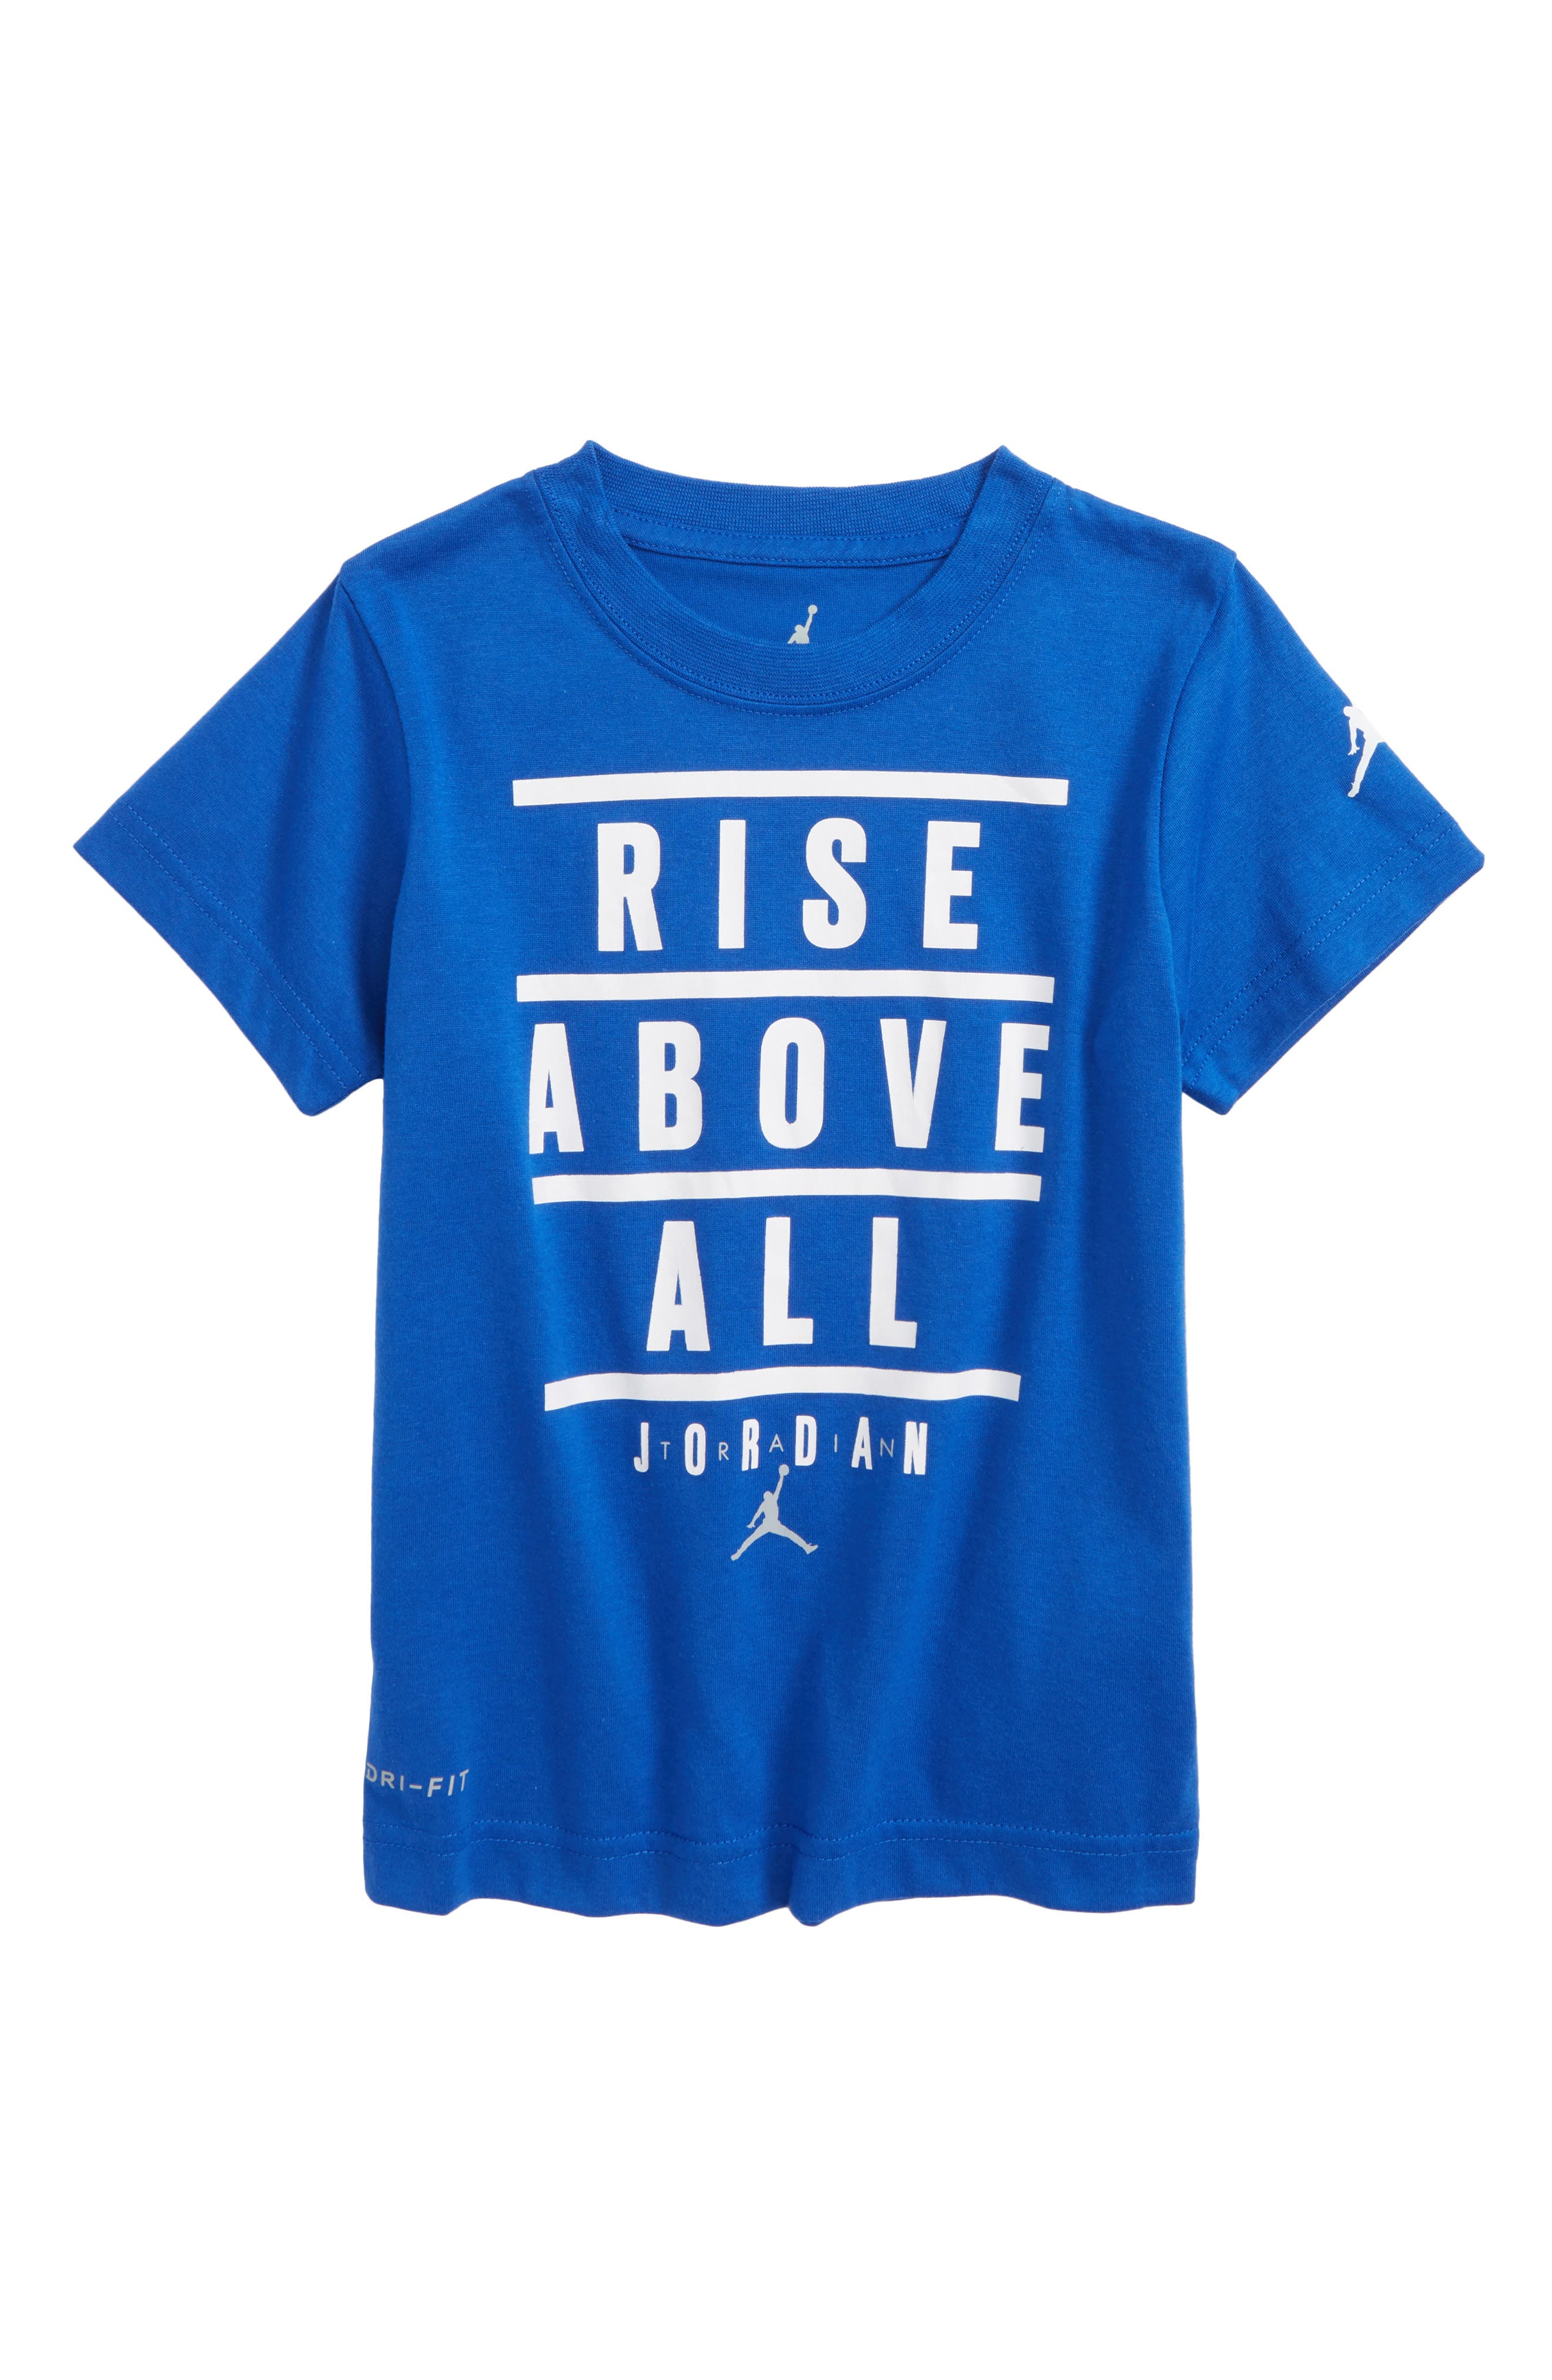 Jordan Motivational Dri-FIT T-Shirt,                         Main,                         color, Hyper Royal